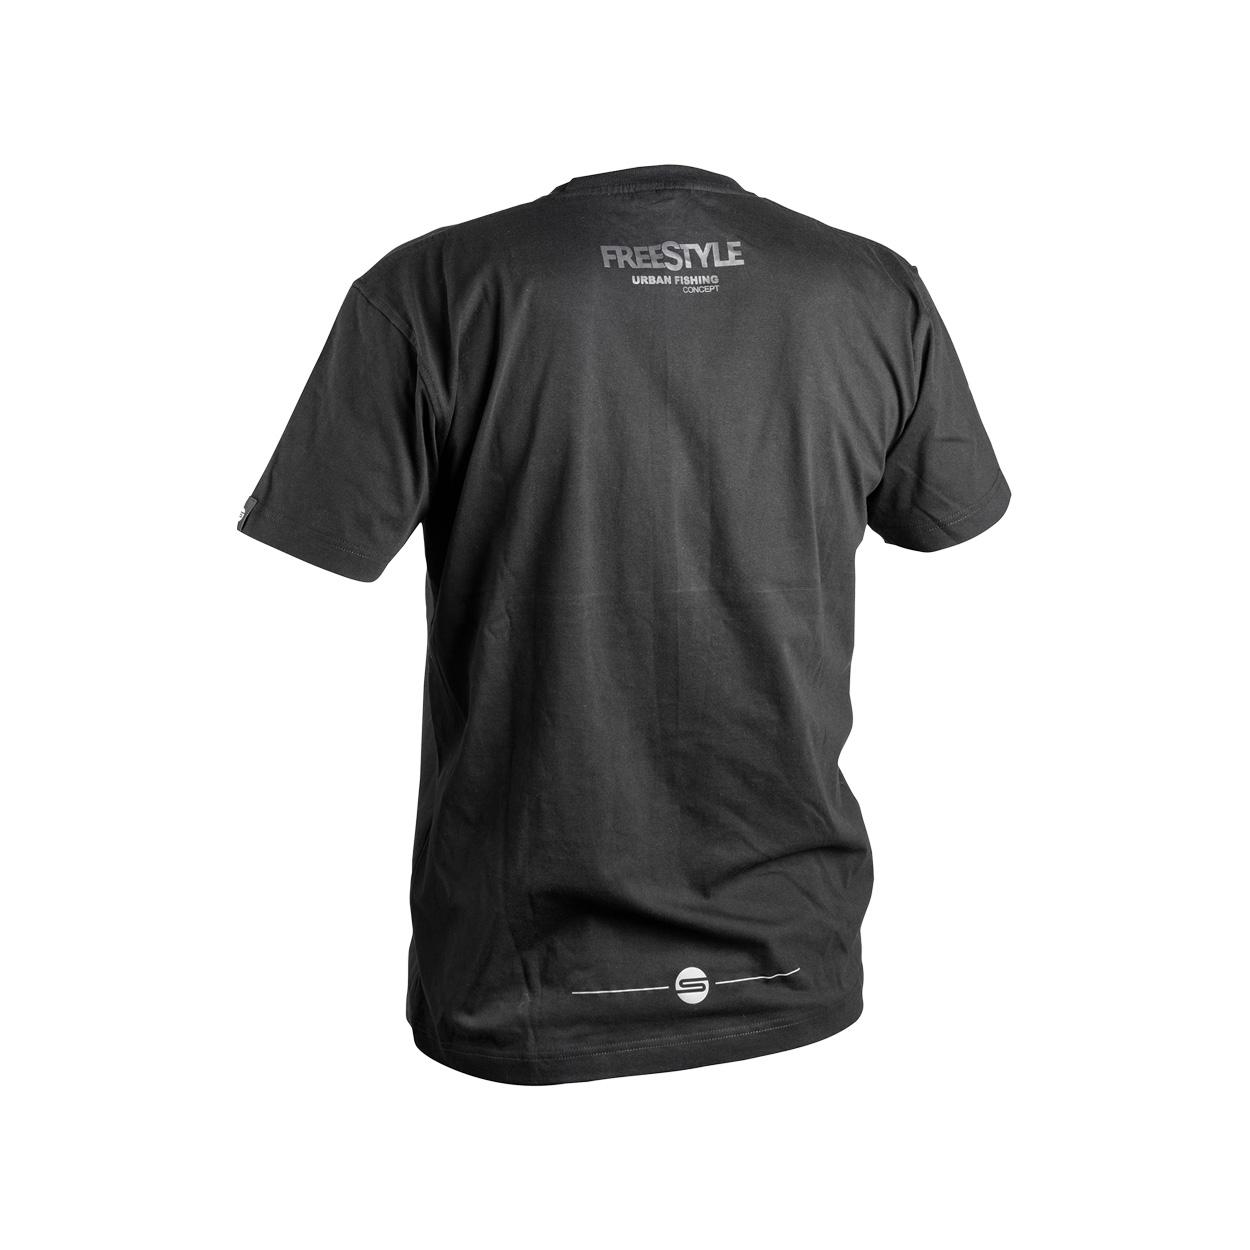 Freestyle - T-Shirt - Black 02